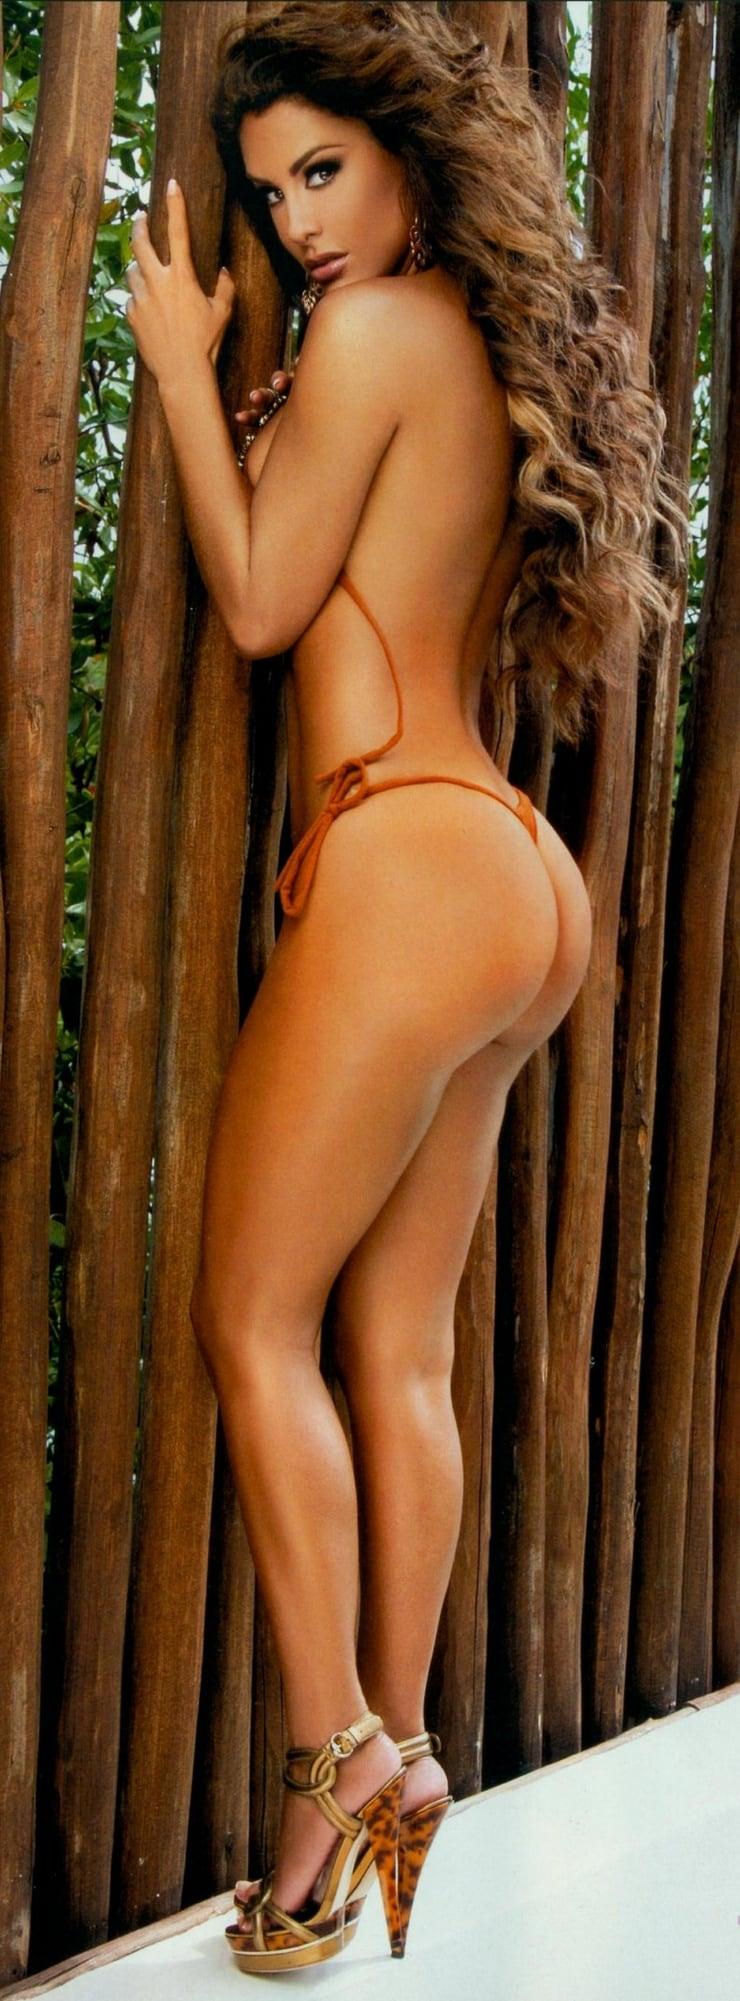 Scandal ninel conde fake porn pics asian girls bikini